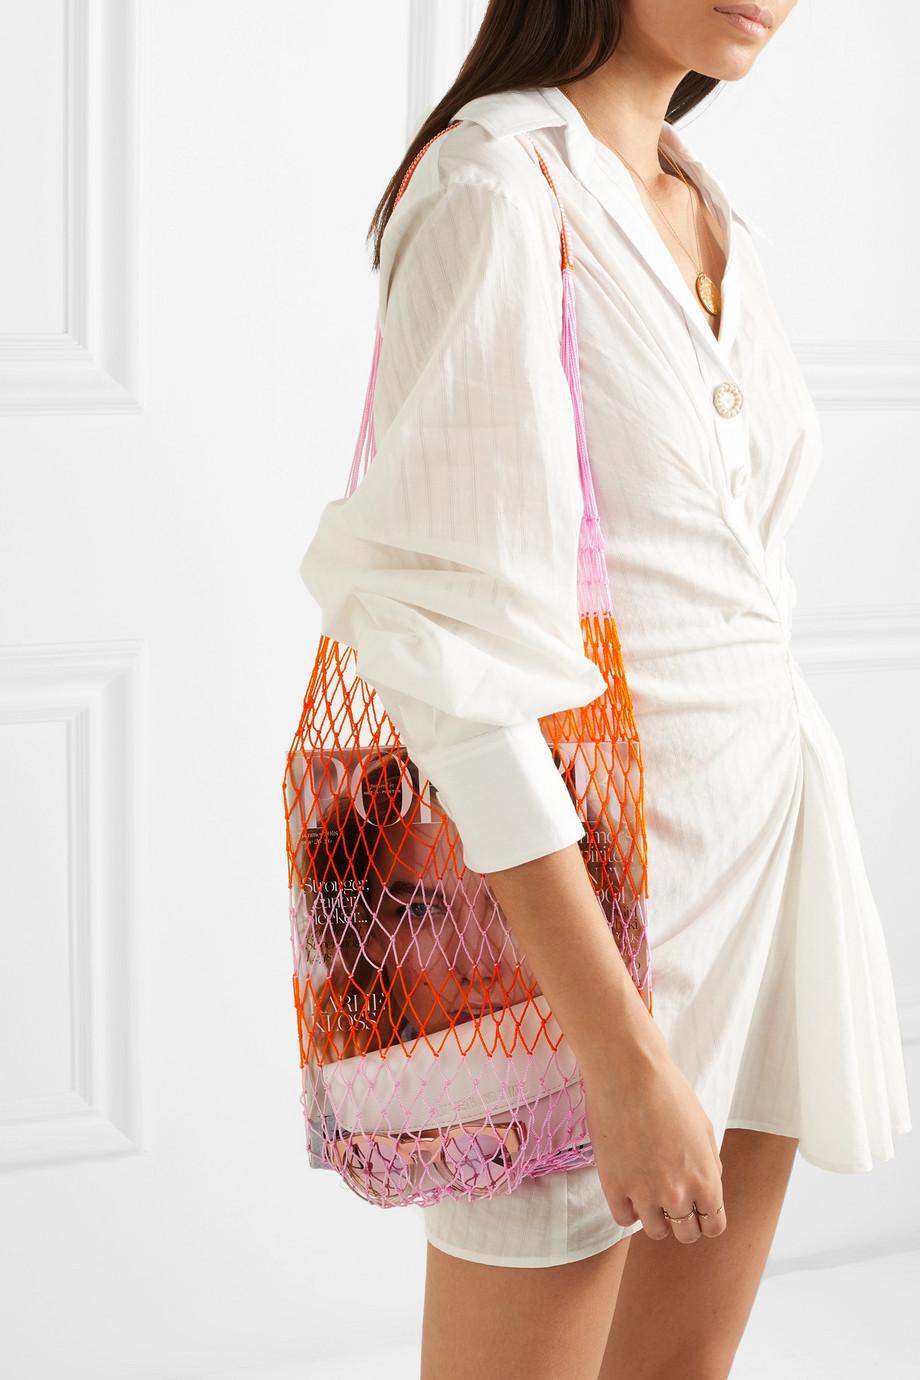 Sophie Anderson Striped macramé shoulder bag $255